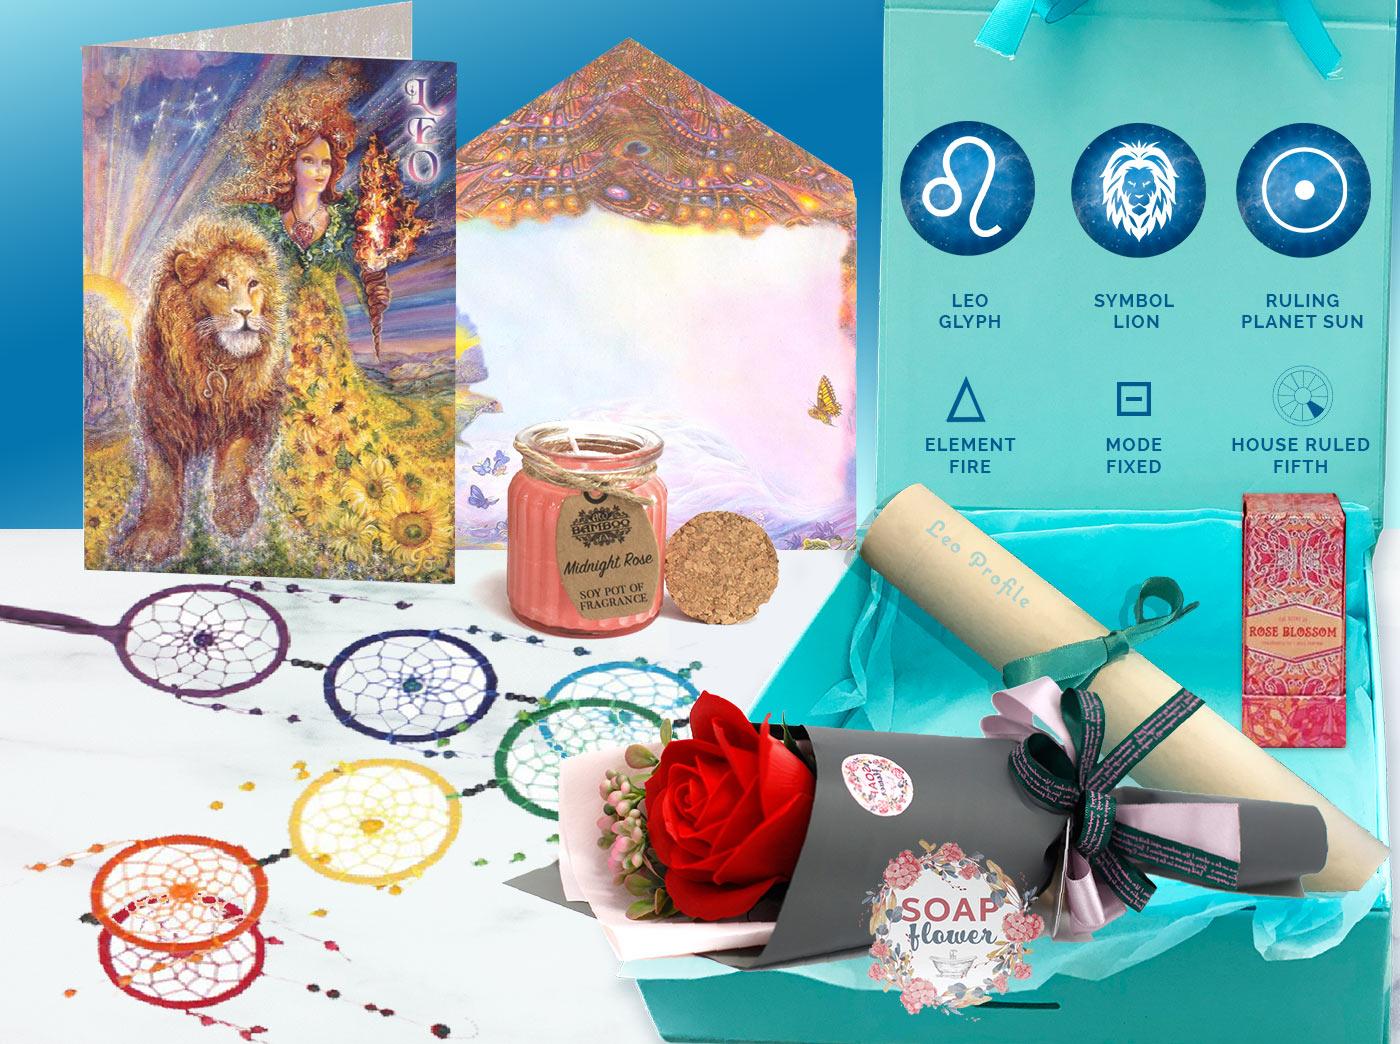 Leo Gift Box and card